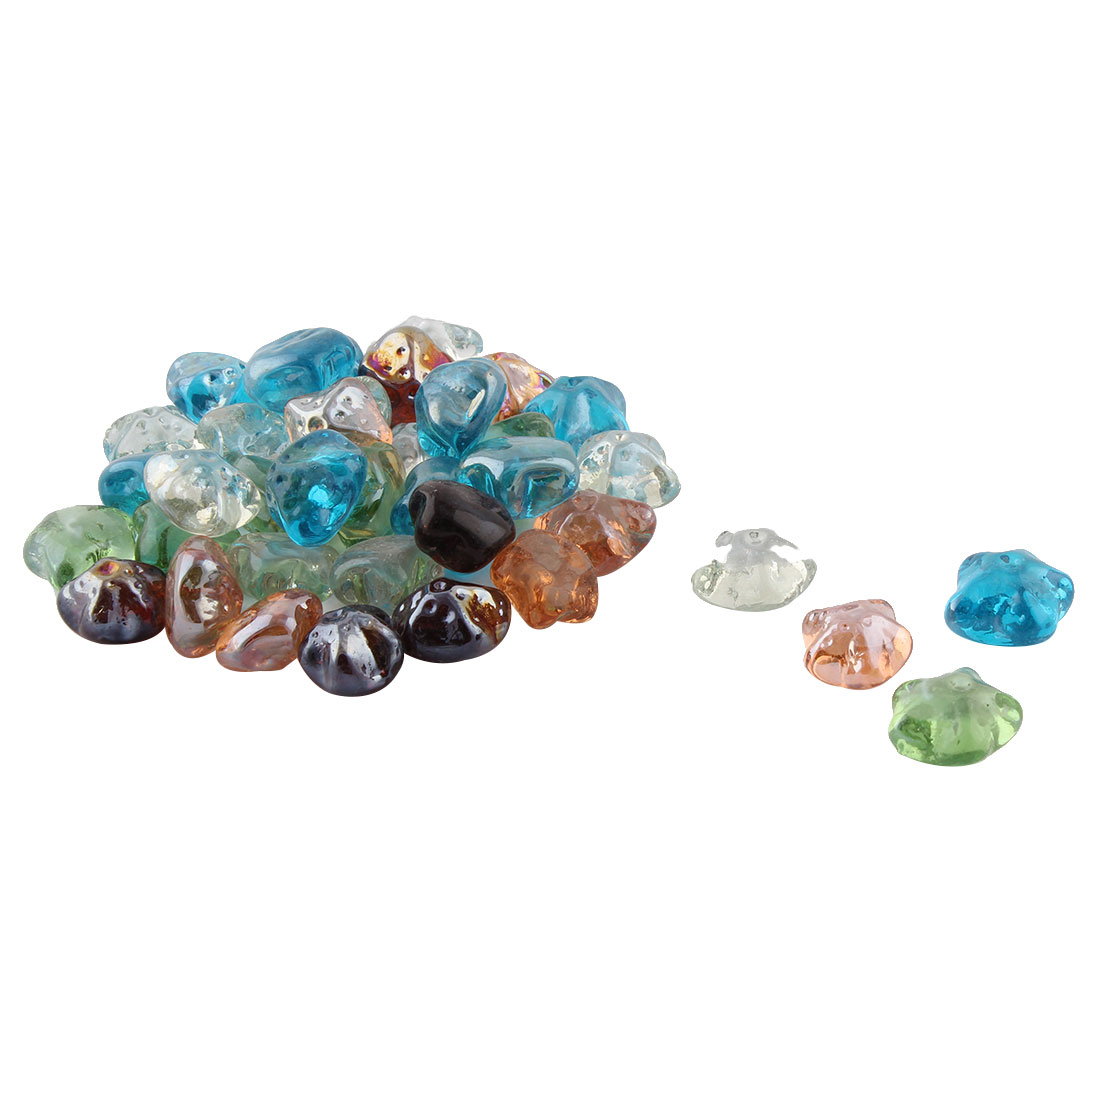 Fish Tank Aquarium Glass Star Shaped Decorative Stone Ornament Colorful 39pcs